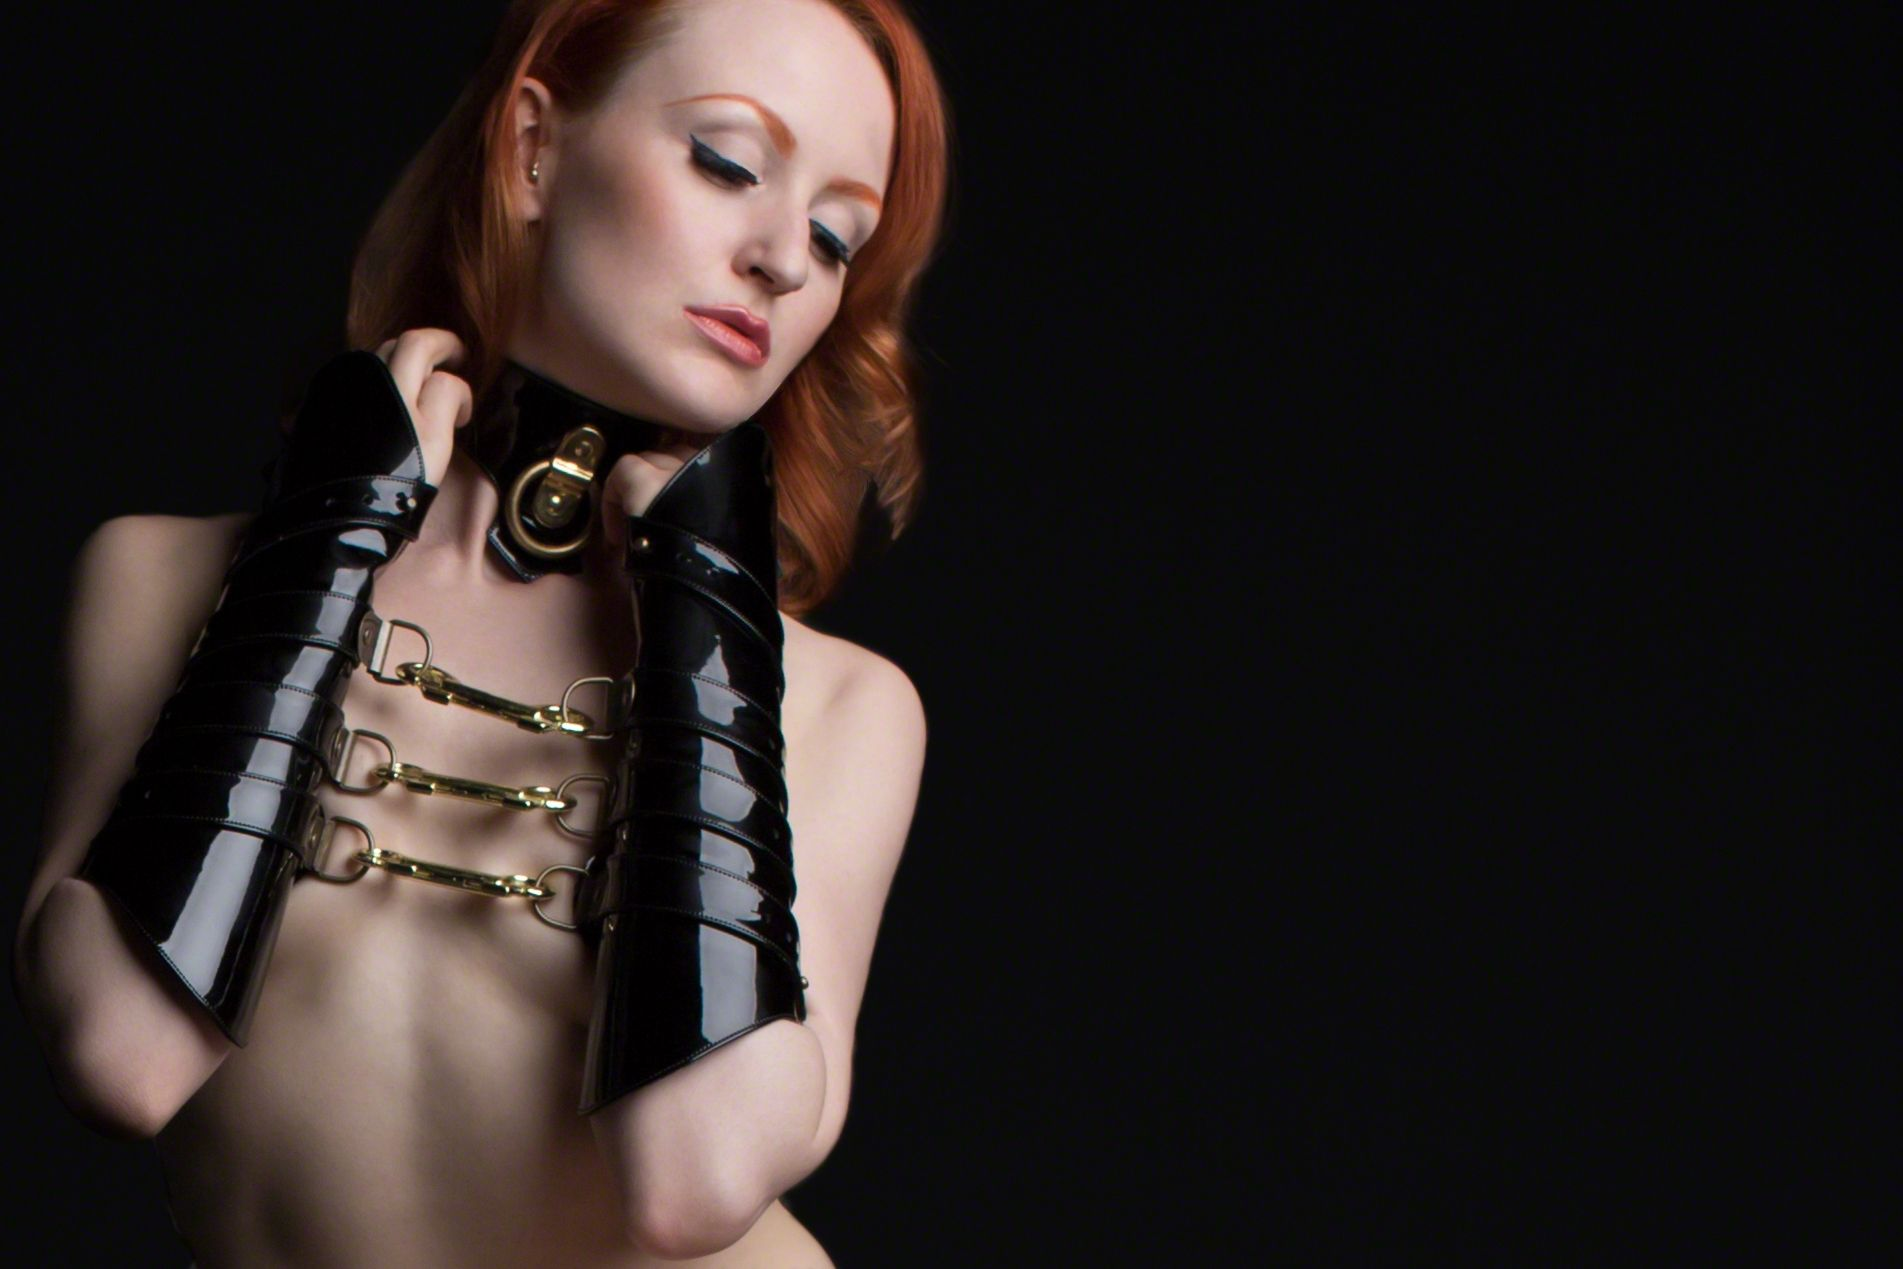 Anita De Bauch wearing accessories HANDMADE in London by